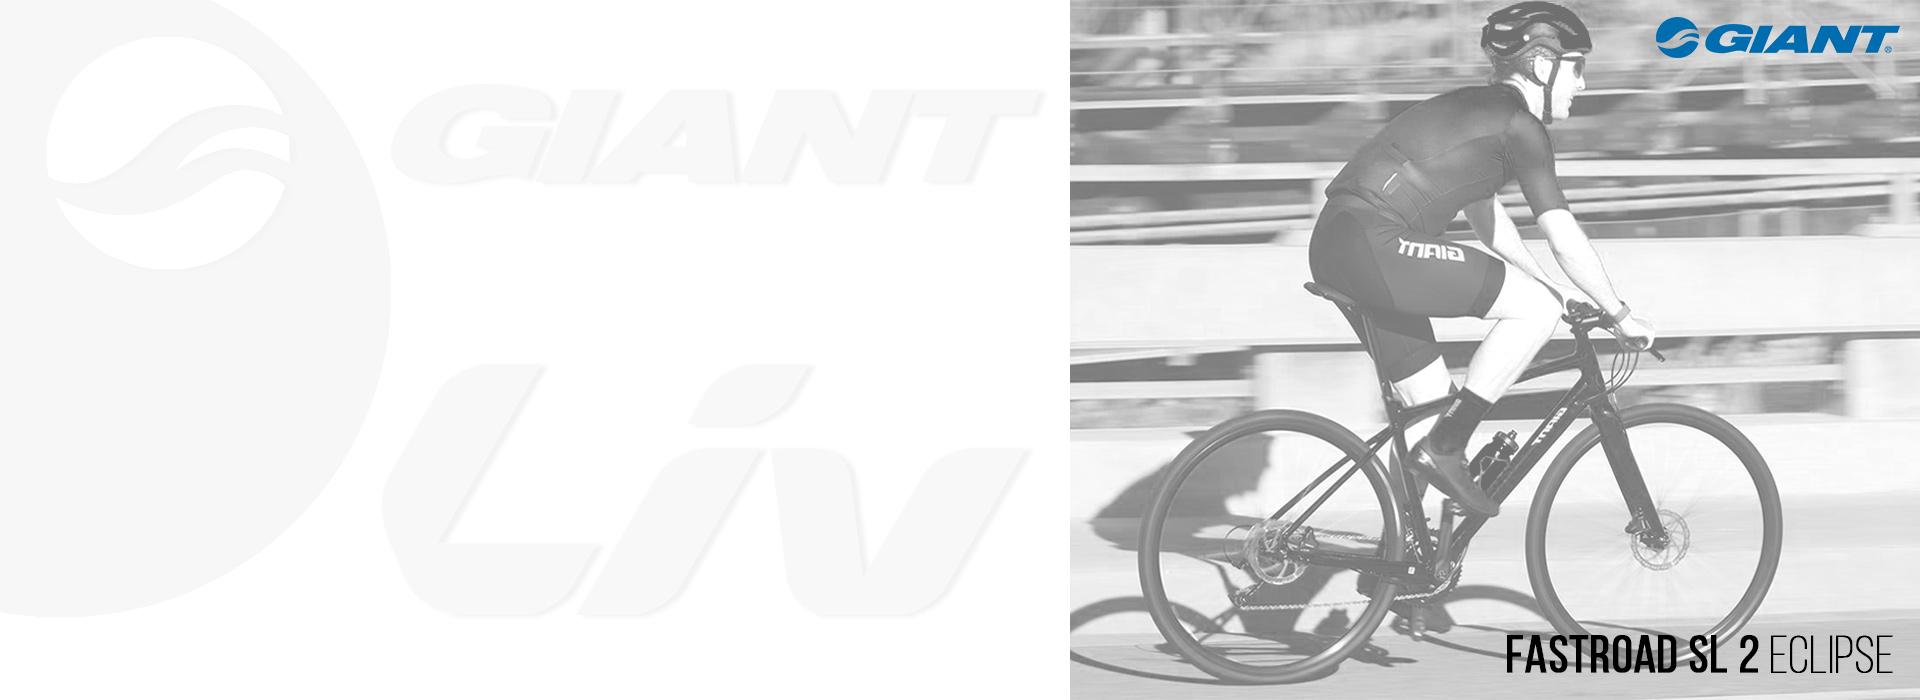 GIANT - LIV 2021